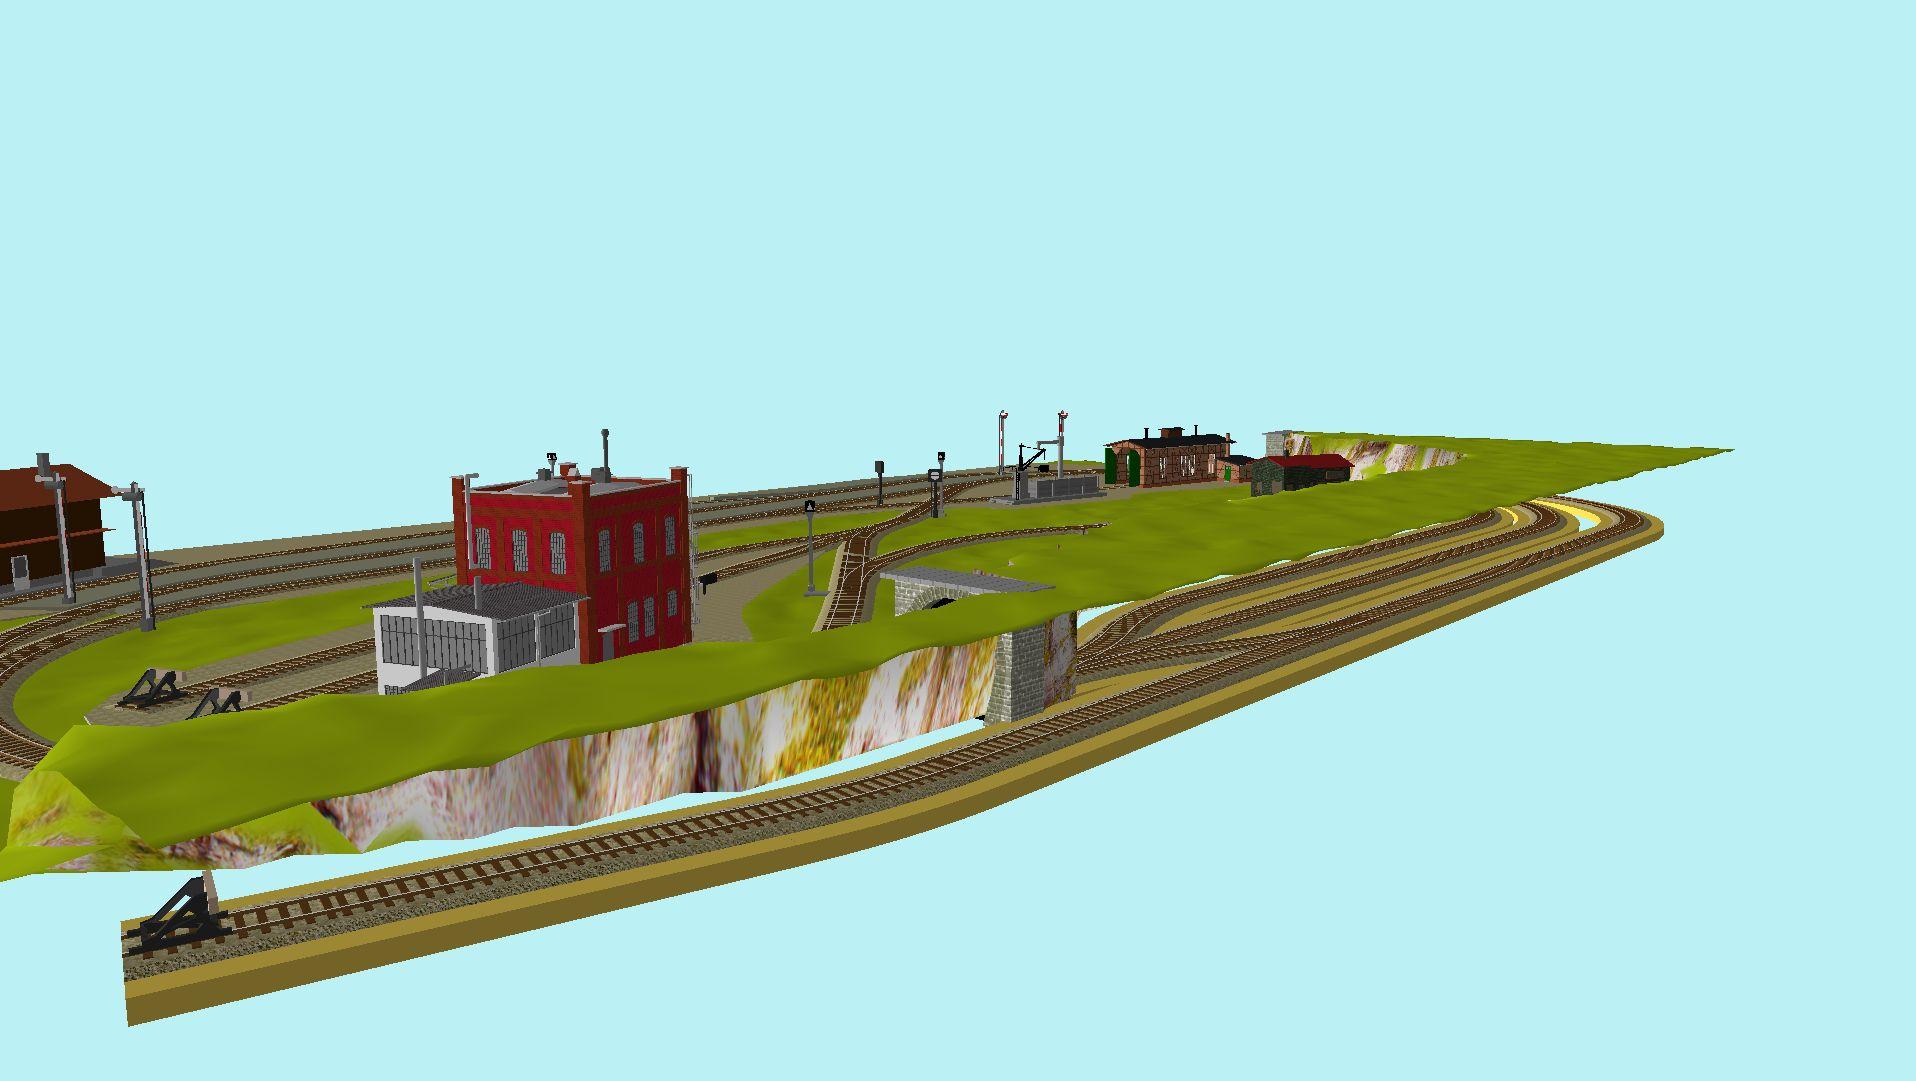 'ALBA Modellbahnpraxis' Band 1, Plan 5 Amp-1_5_m-gleis_sb_1cnkzl